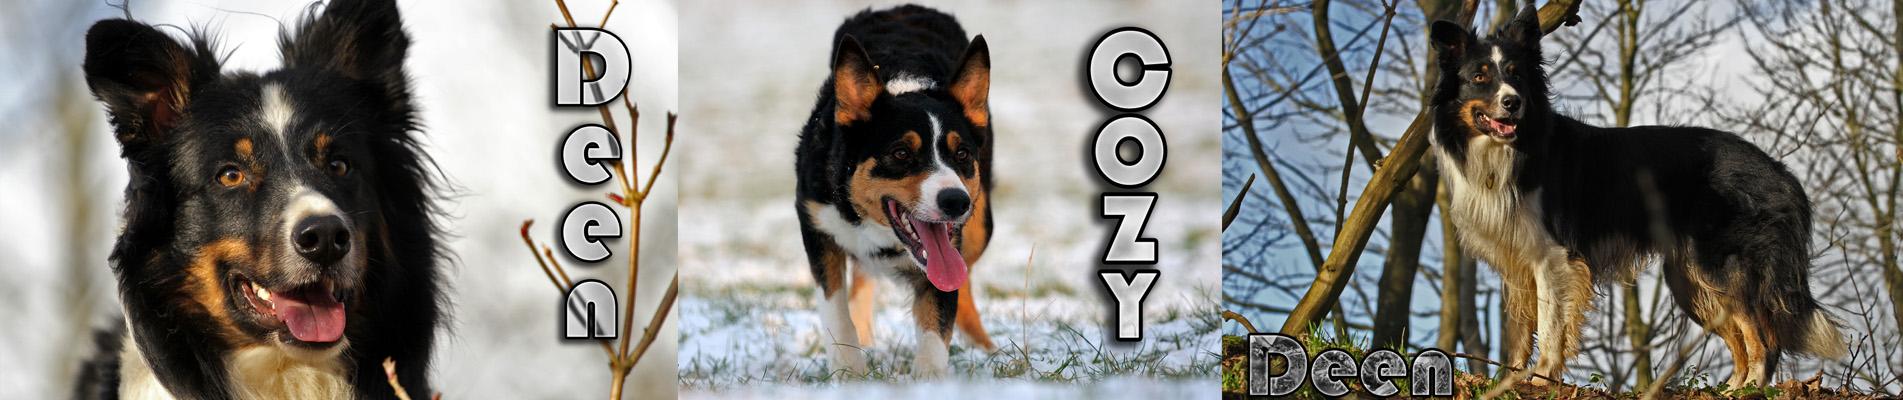 Cozy has been mated to Deen